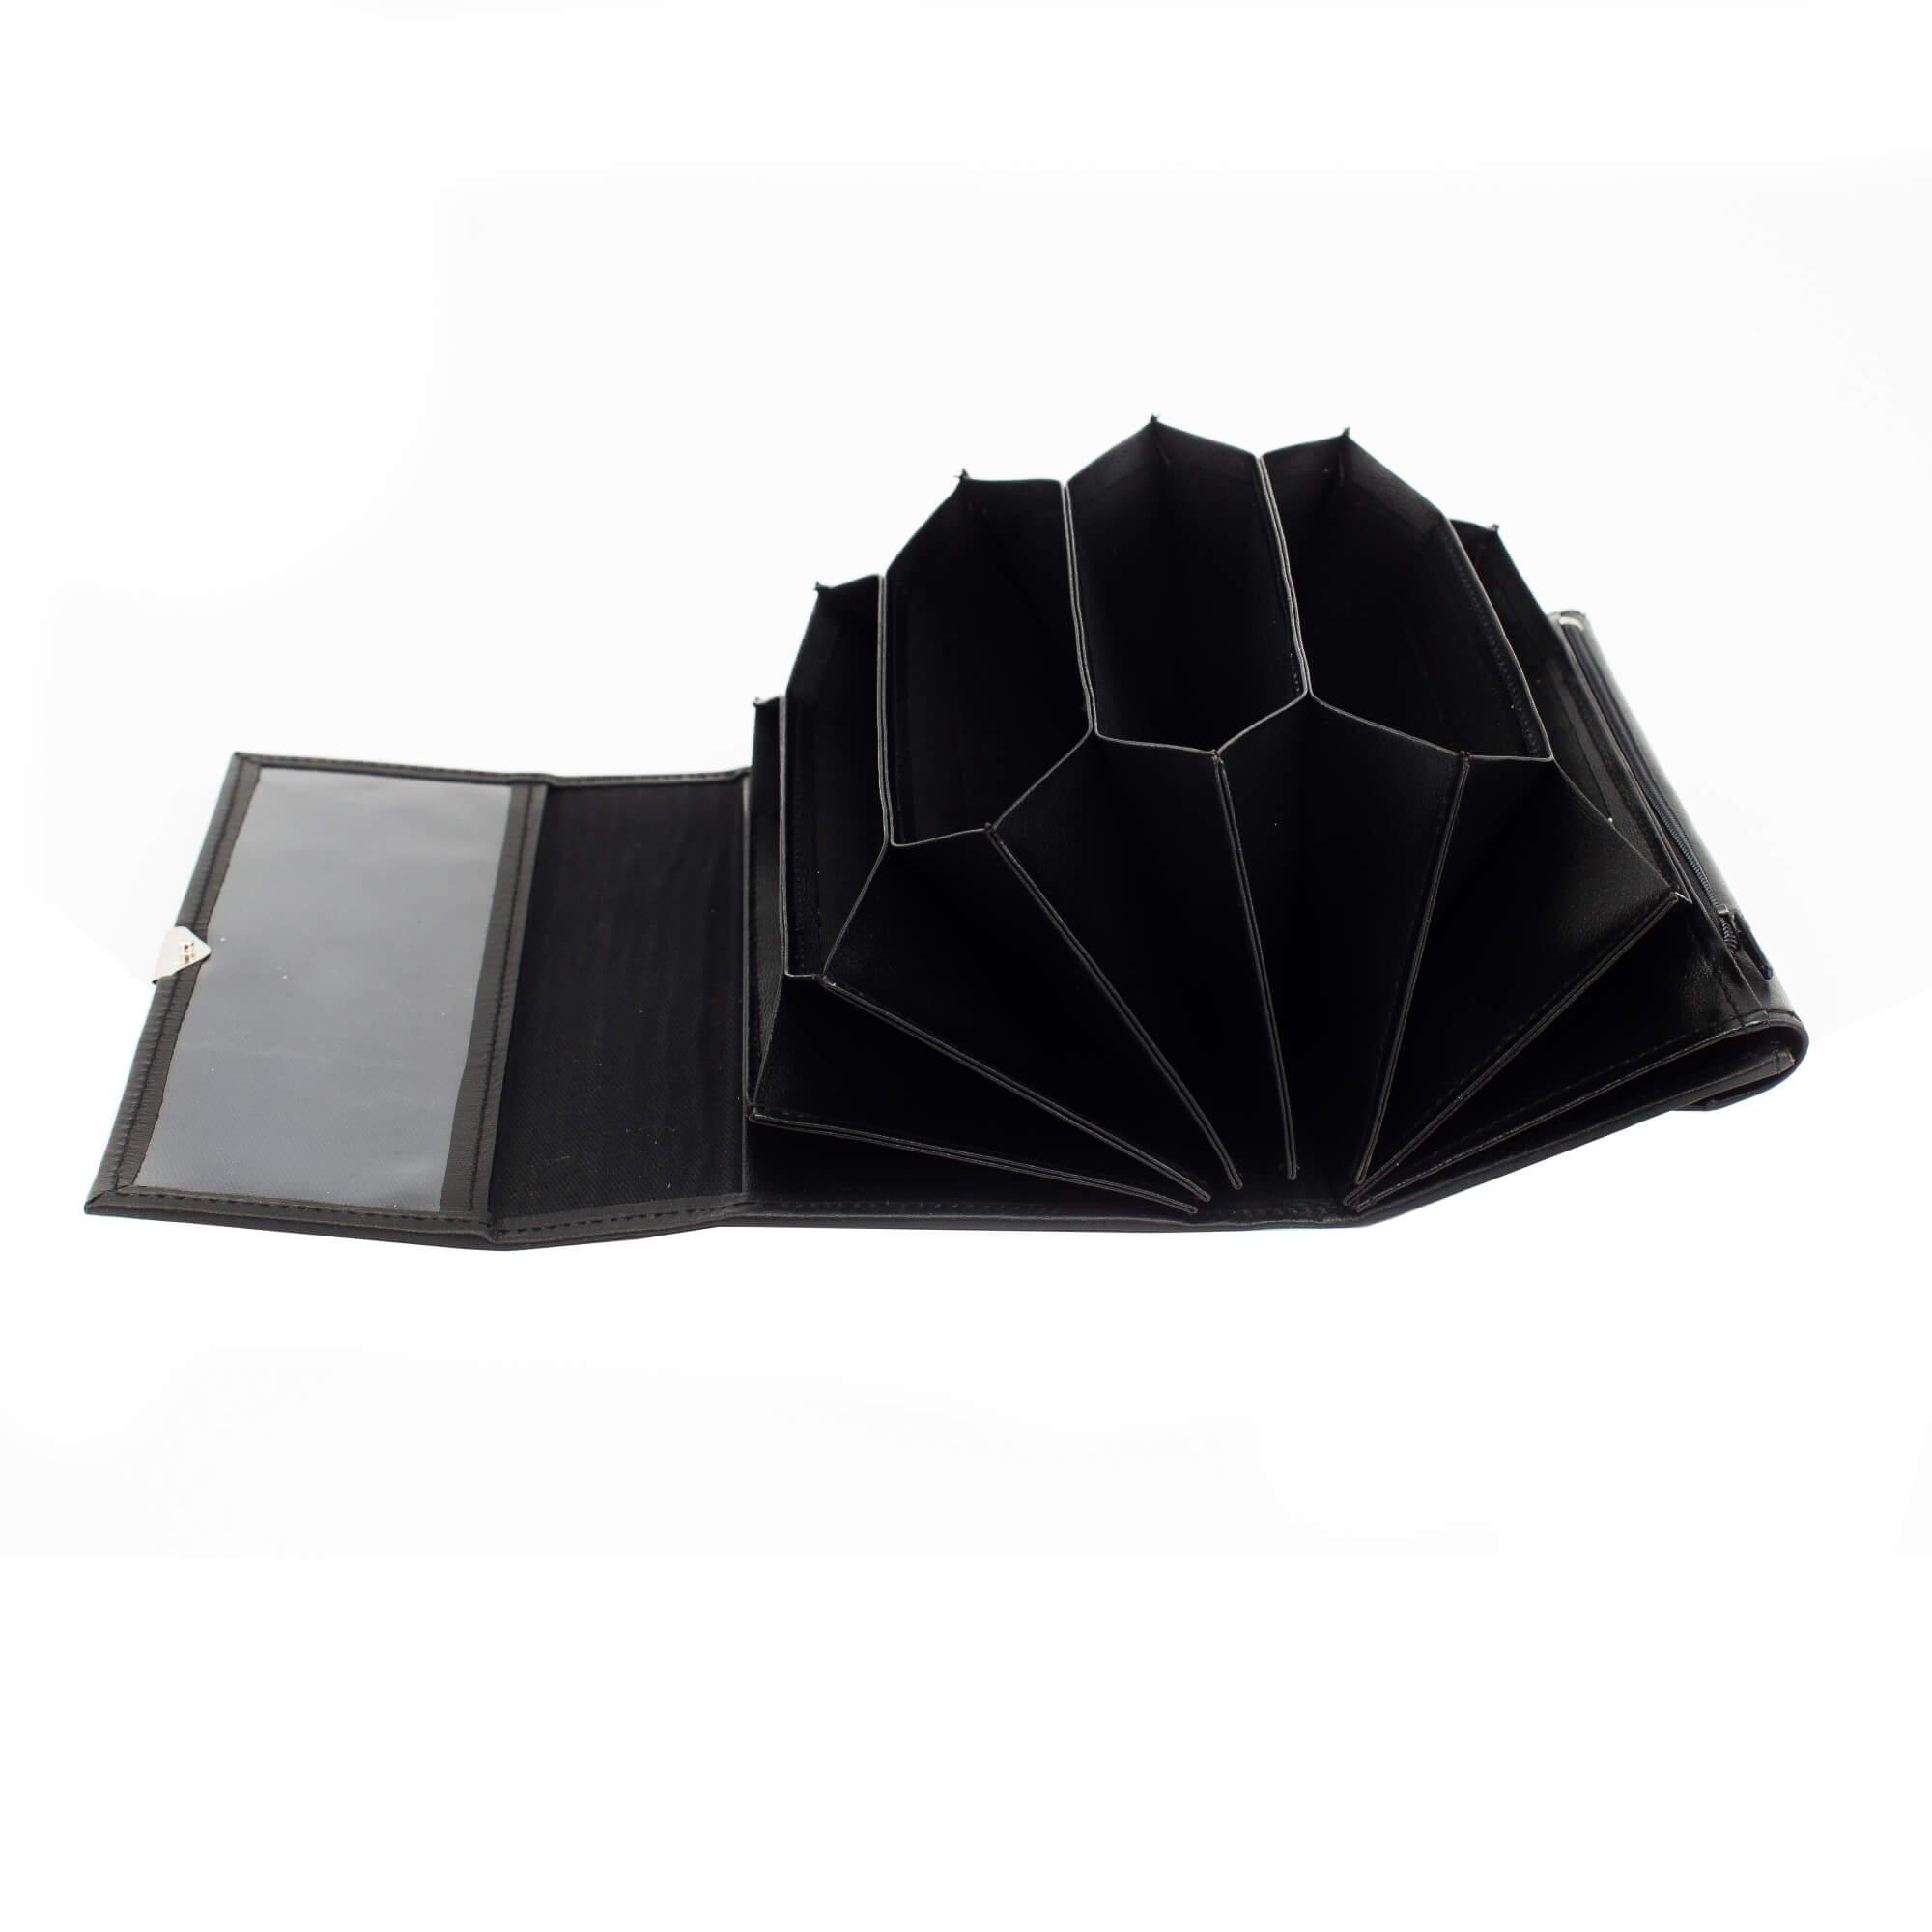 Fekete 7 zsebes brifko 20 cm (4)